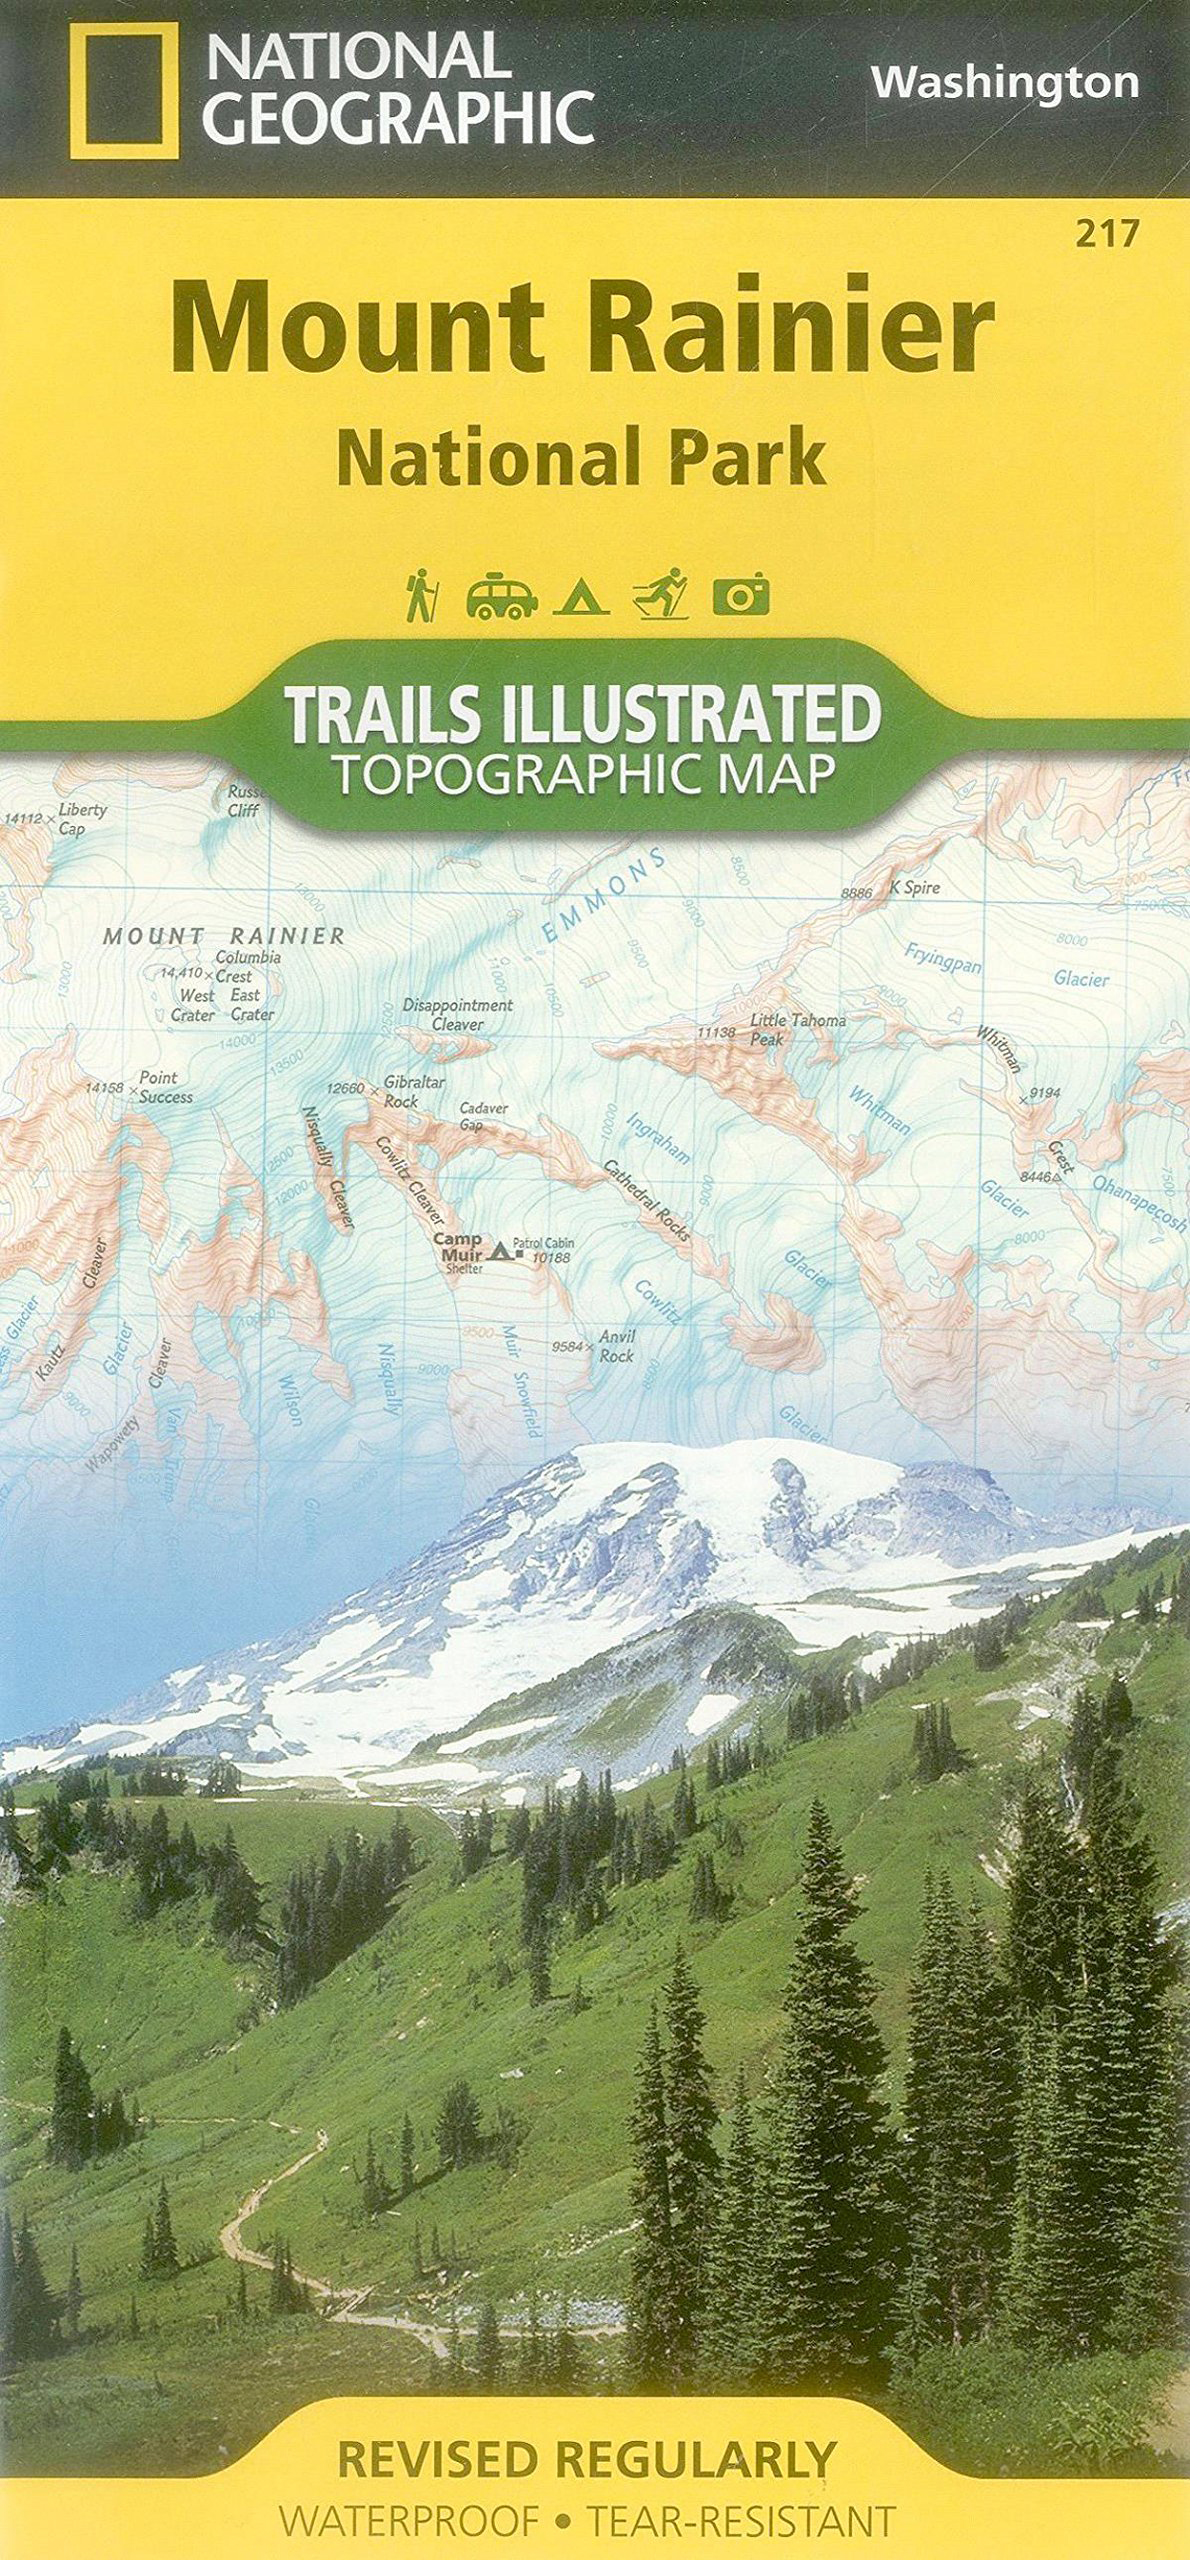 Mt Rainier Topographic Map.Mt Rainier National Park